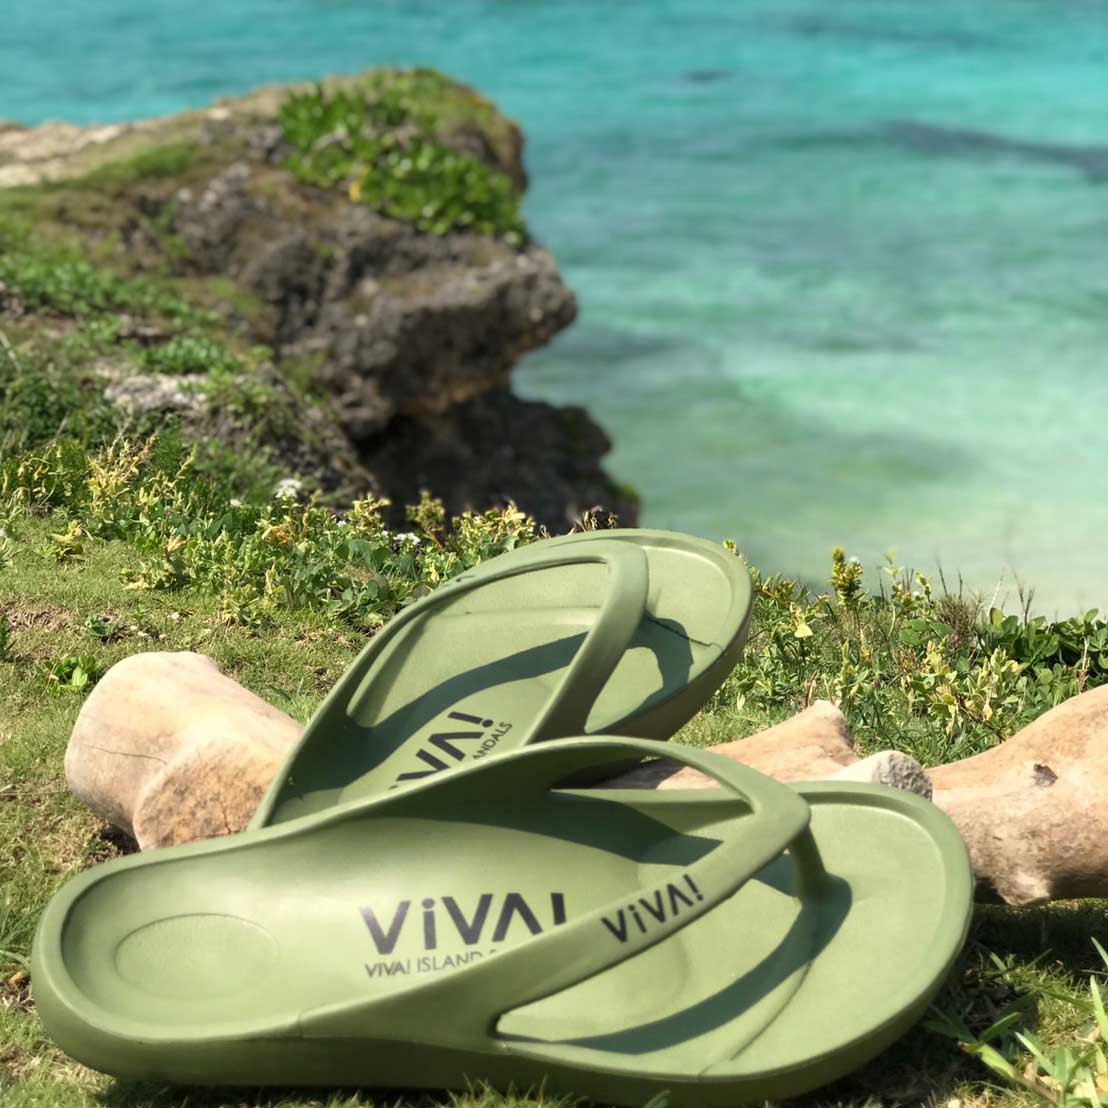 VIVA! ISLAND (khaki) ビバアイランド FLIP FLOP ビーチサンダル